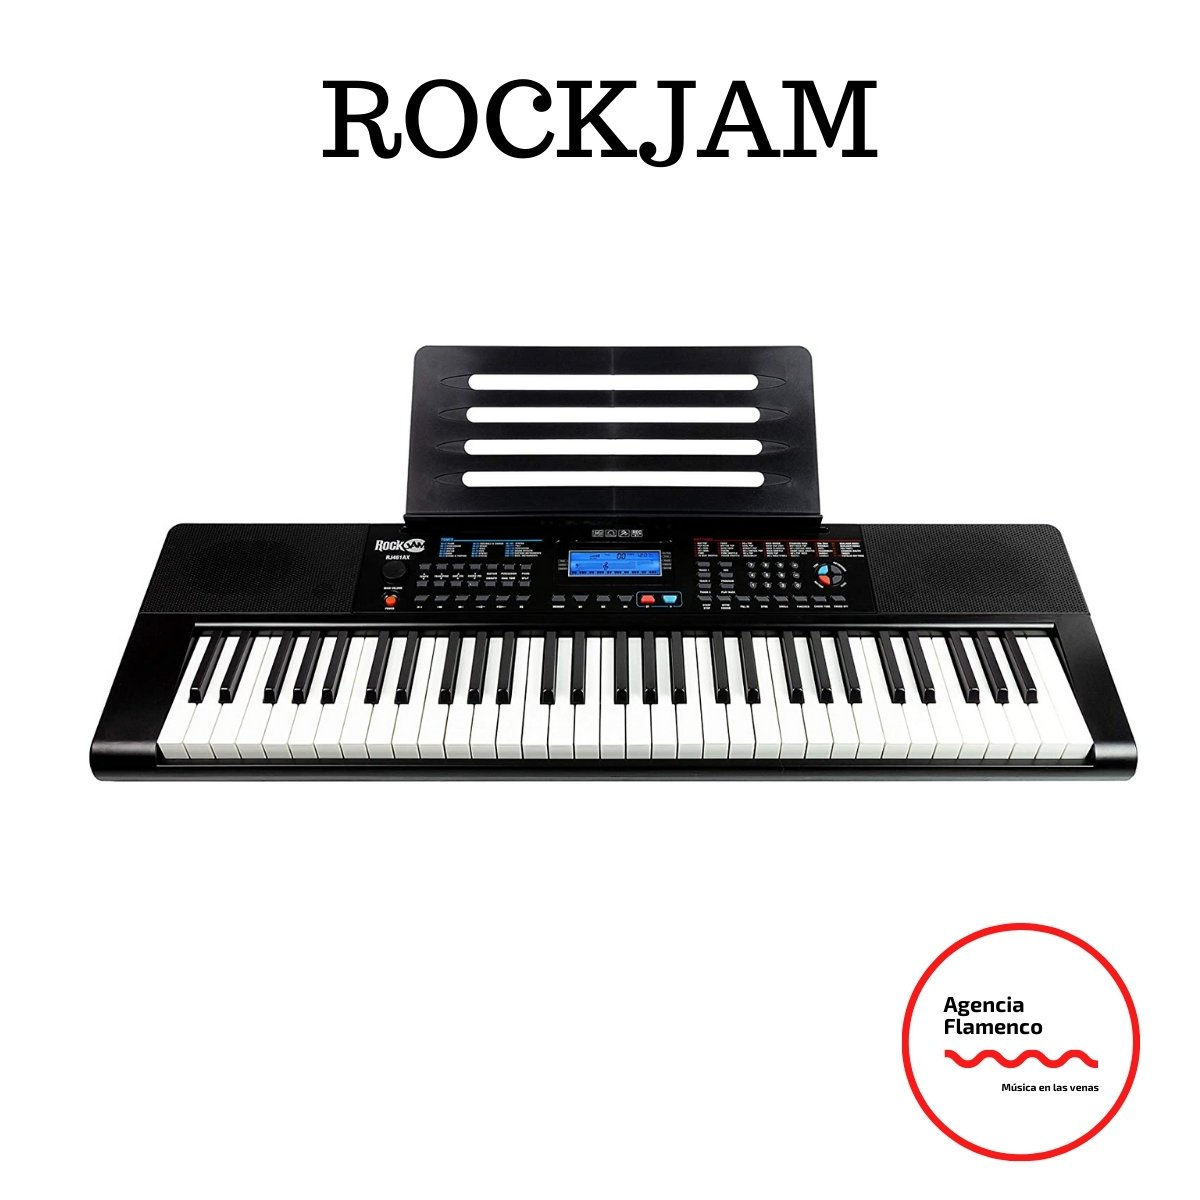 2. RockJam RJ461AX Teclado de piano digital portátil Alexa de 61 teclas